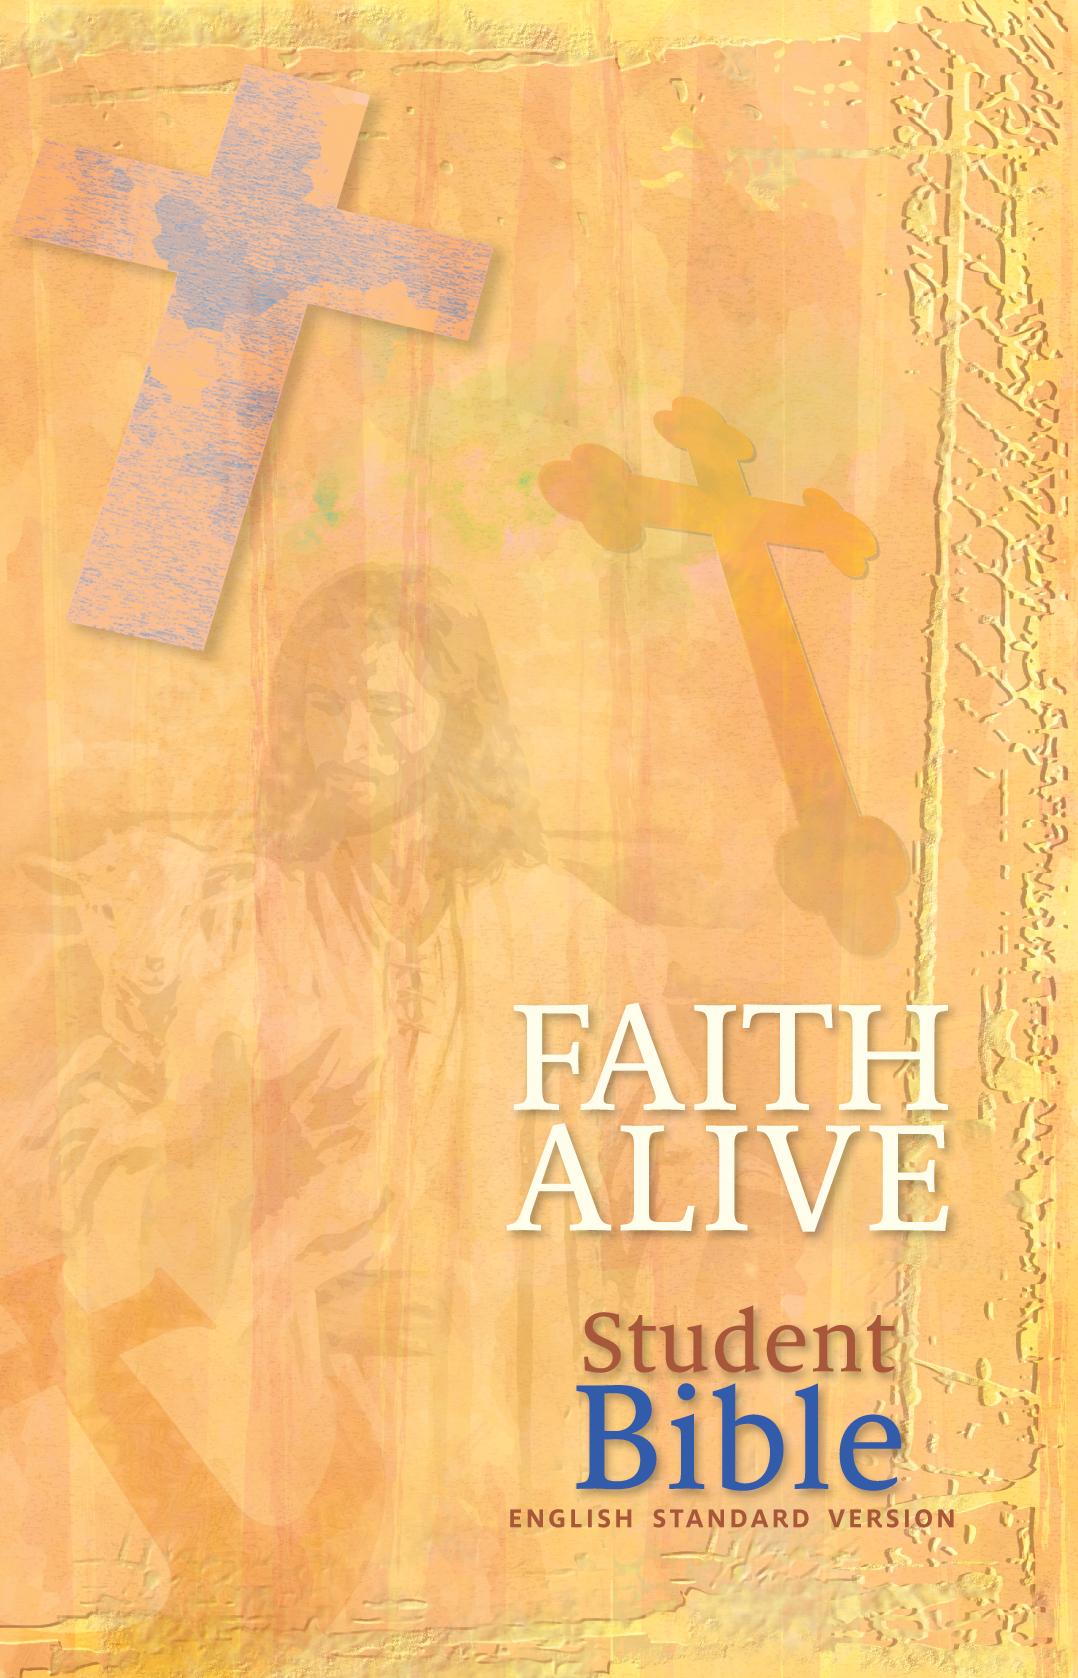 Faith Alive Student Bible - ESV Translation